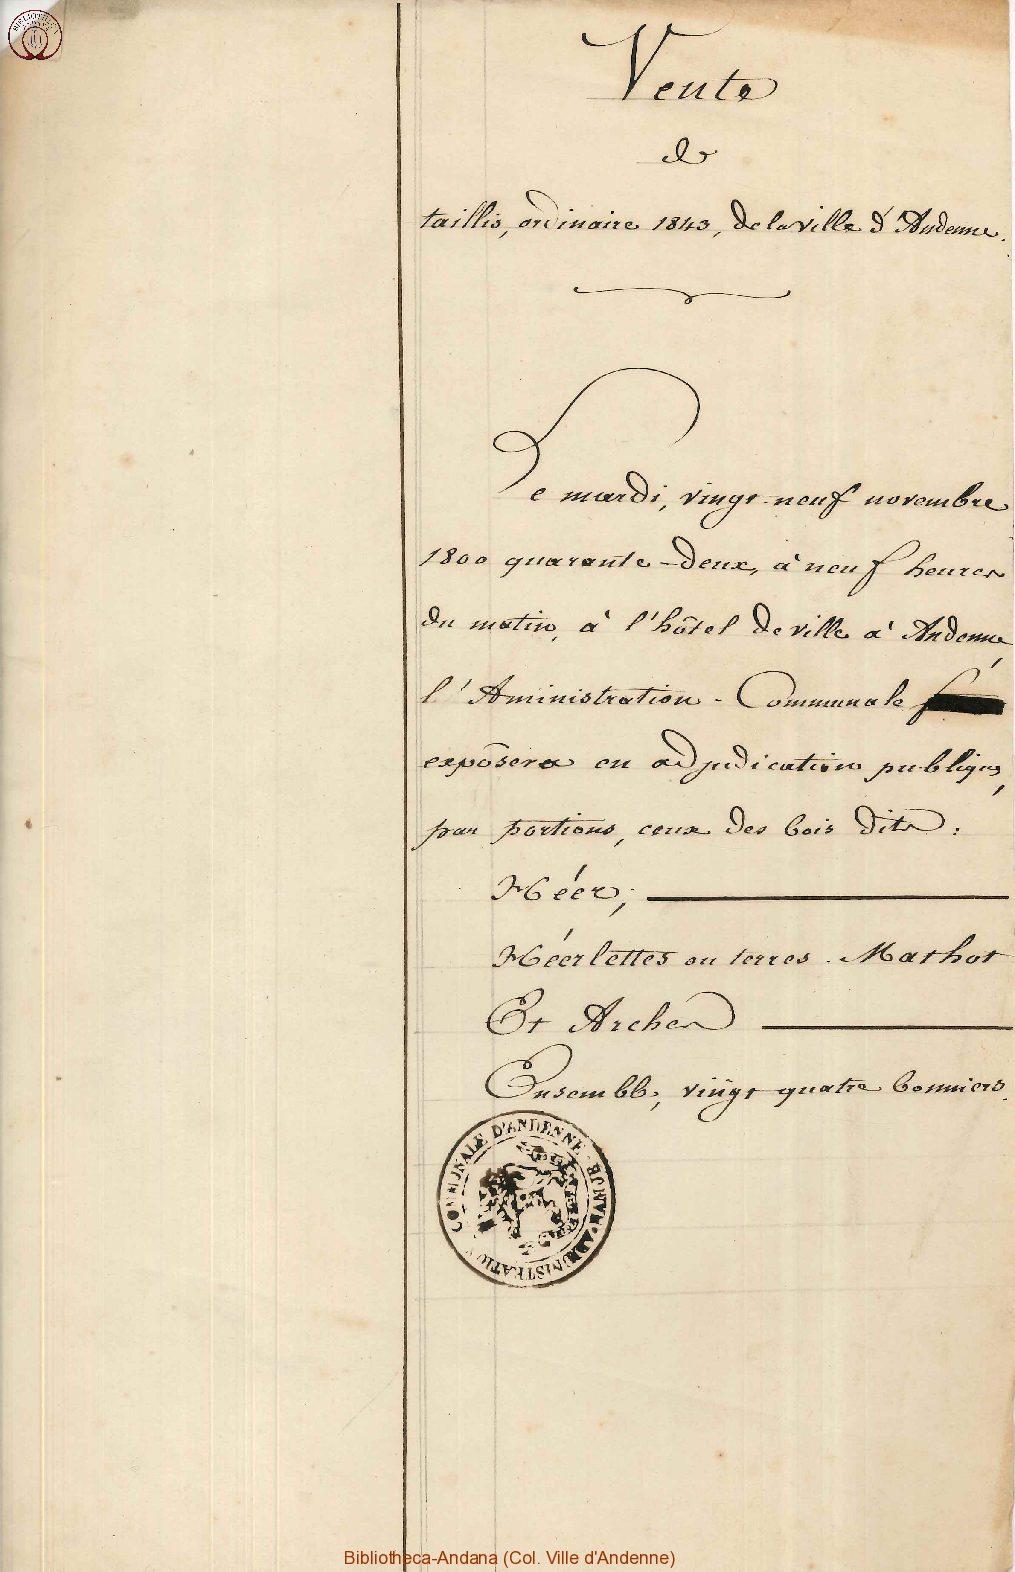 1842-11-29